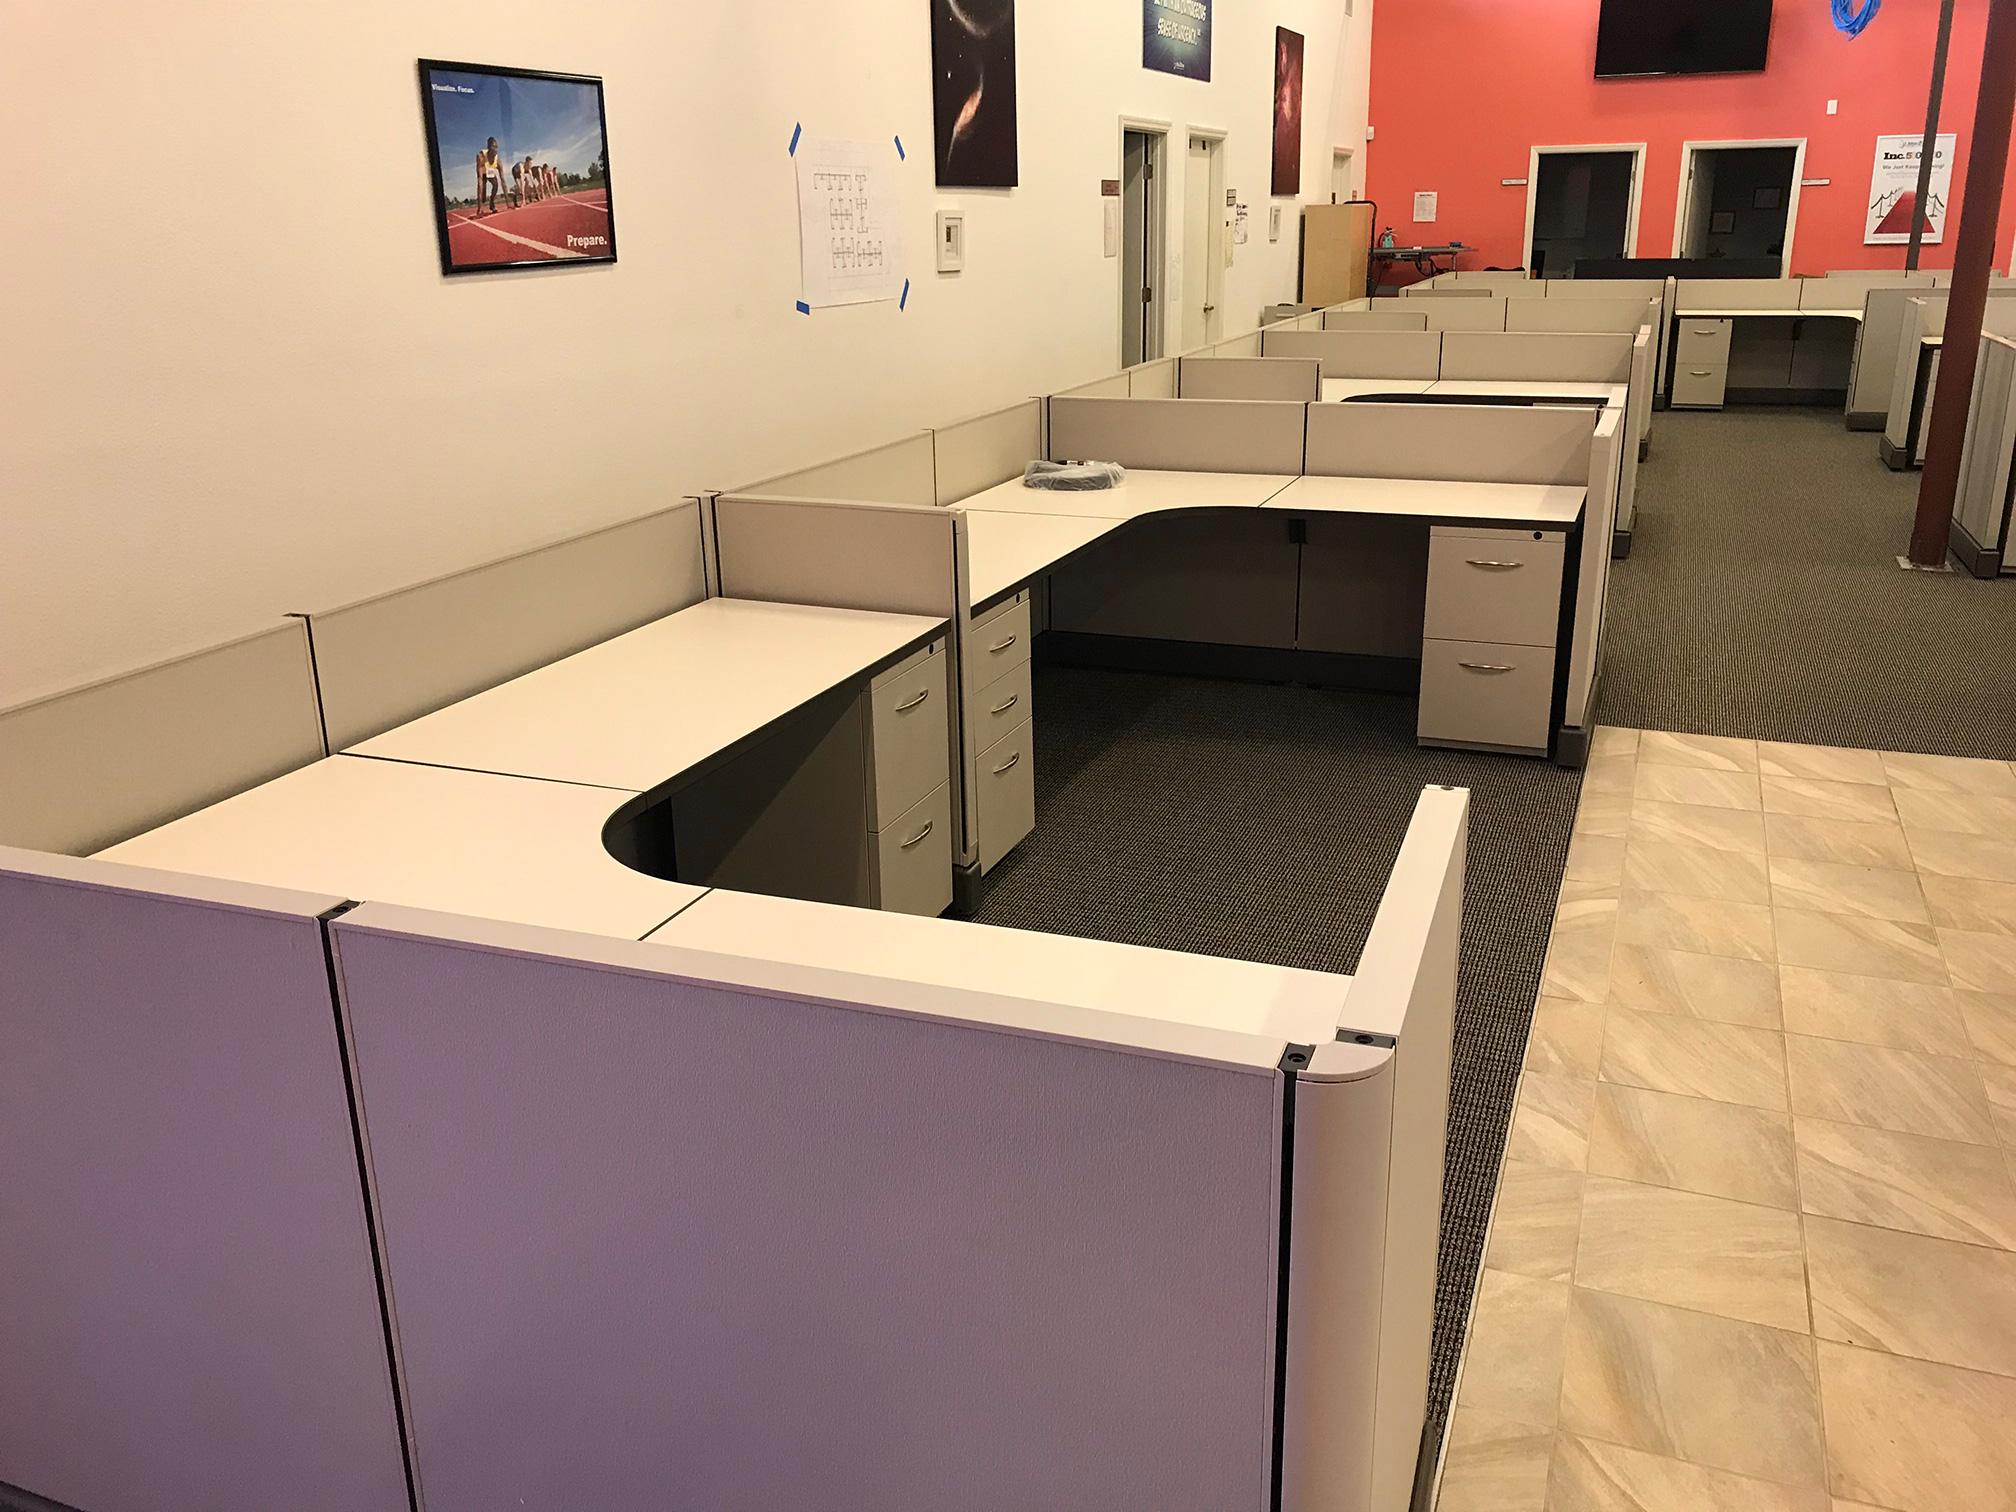 l-shaped-cubicles-for-sale-manasota-office-supplies-llc.jpg